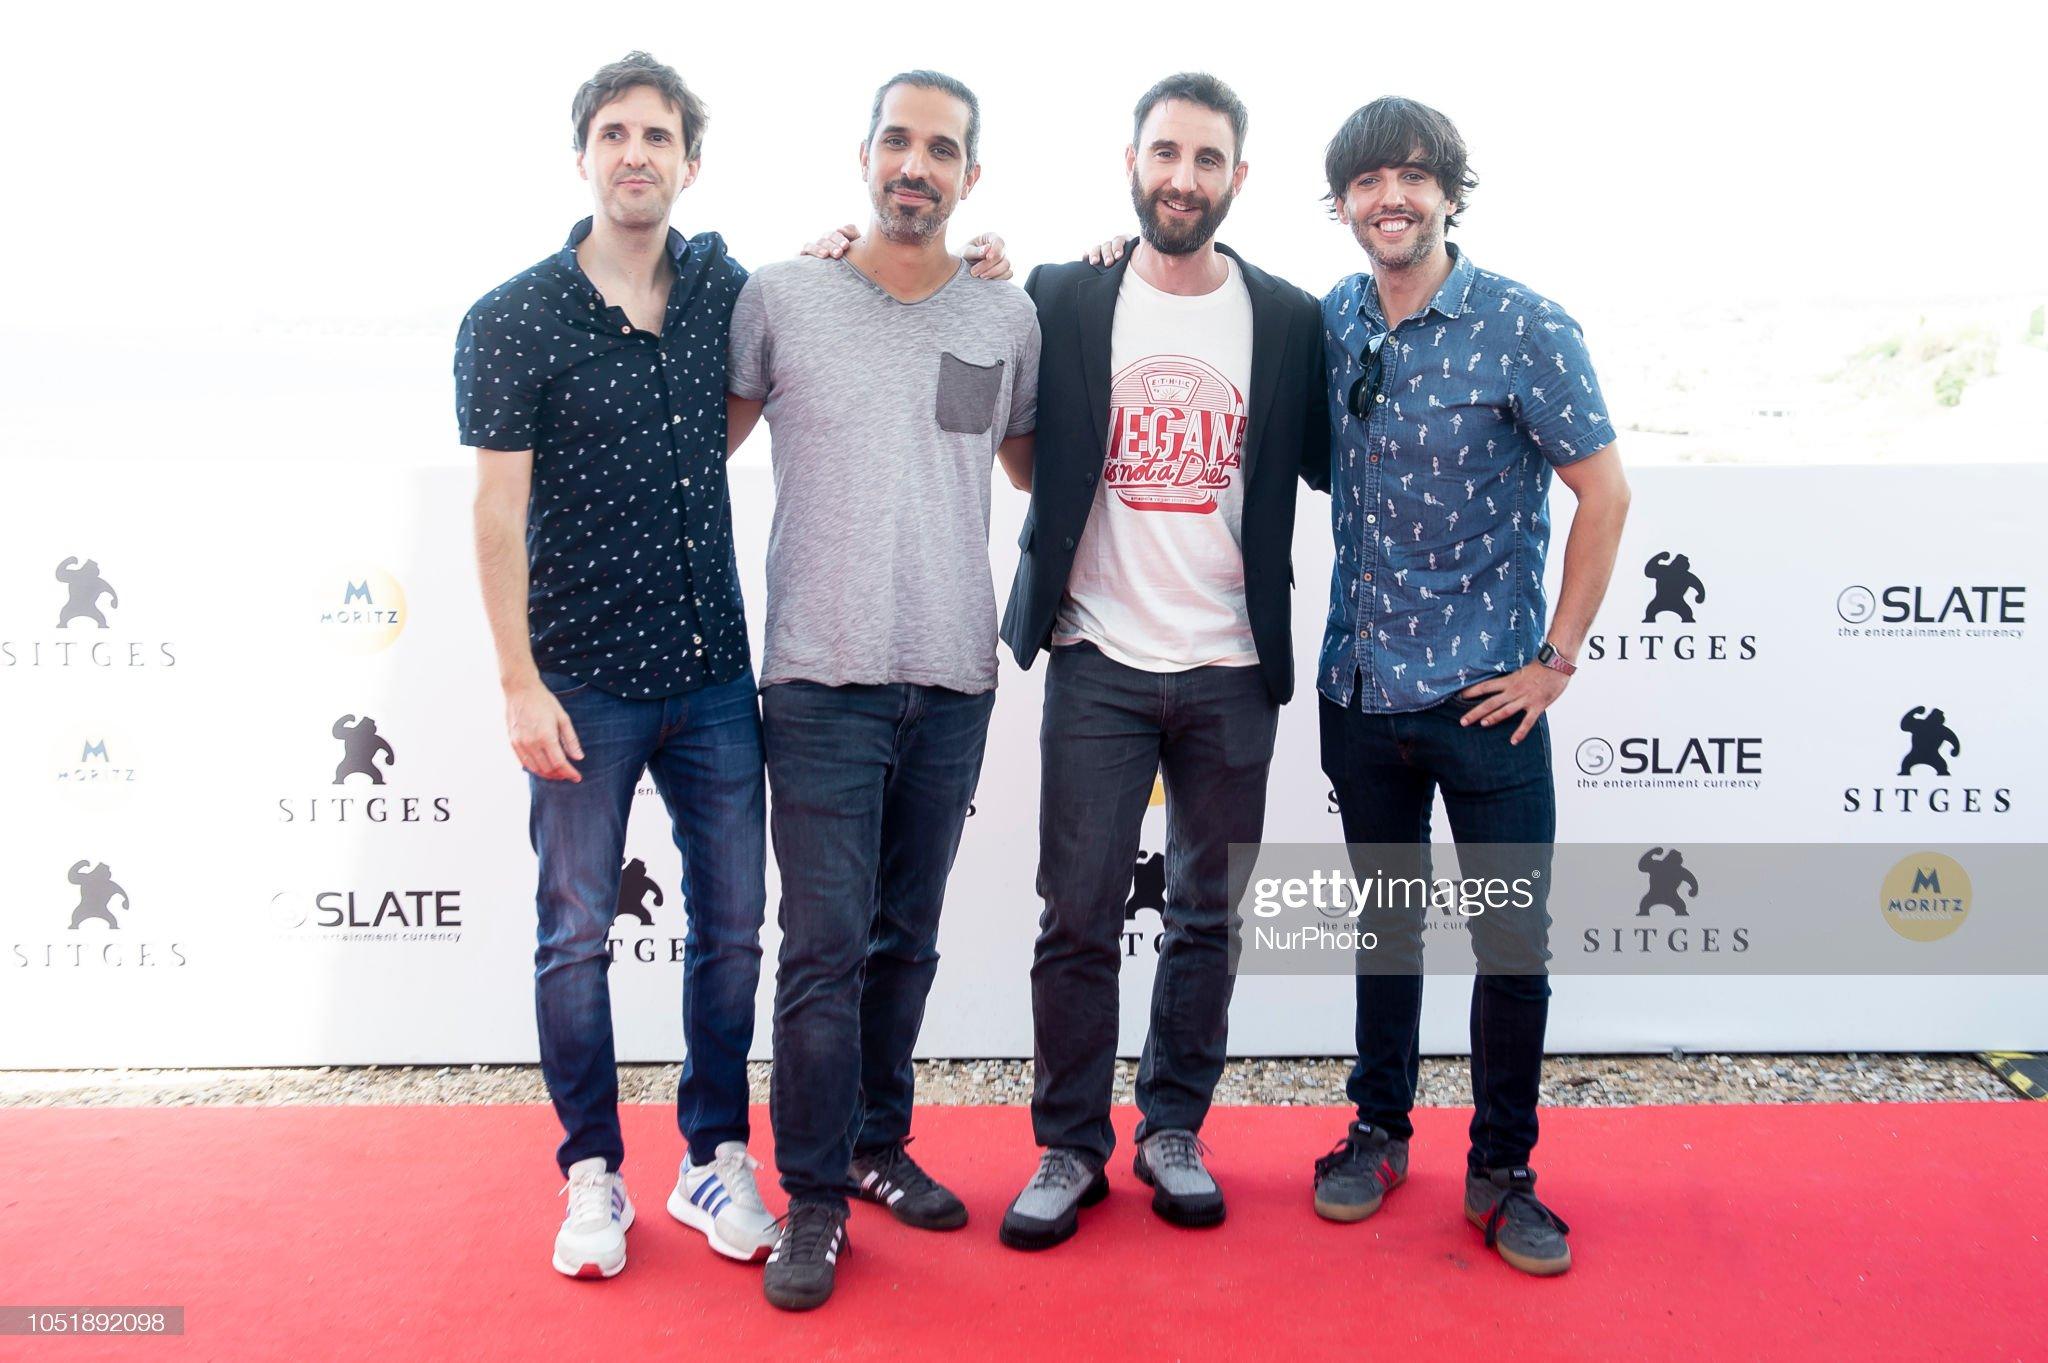 ¿Cuánto mide Julián López? - Altura - Página 3 Actor-julian-lopez-director-javier-ruiz-caldera-actor-dani-rovira-and-picture-id1051892098?s=2048x2048